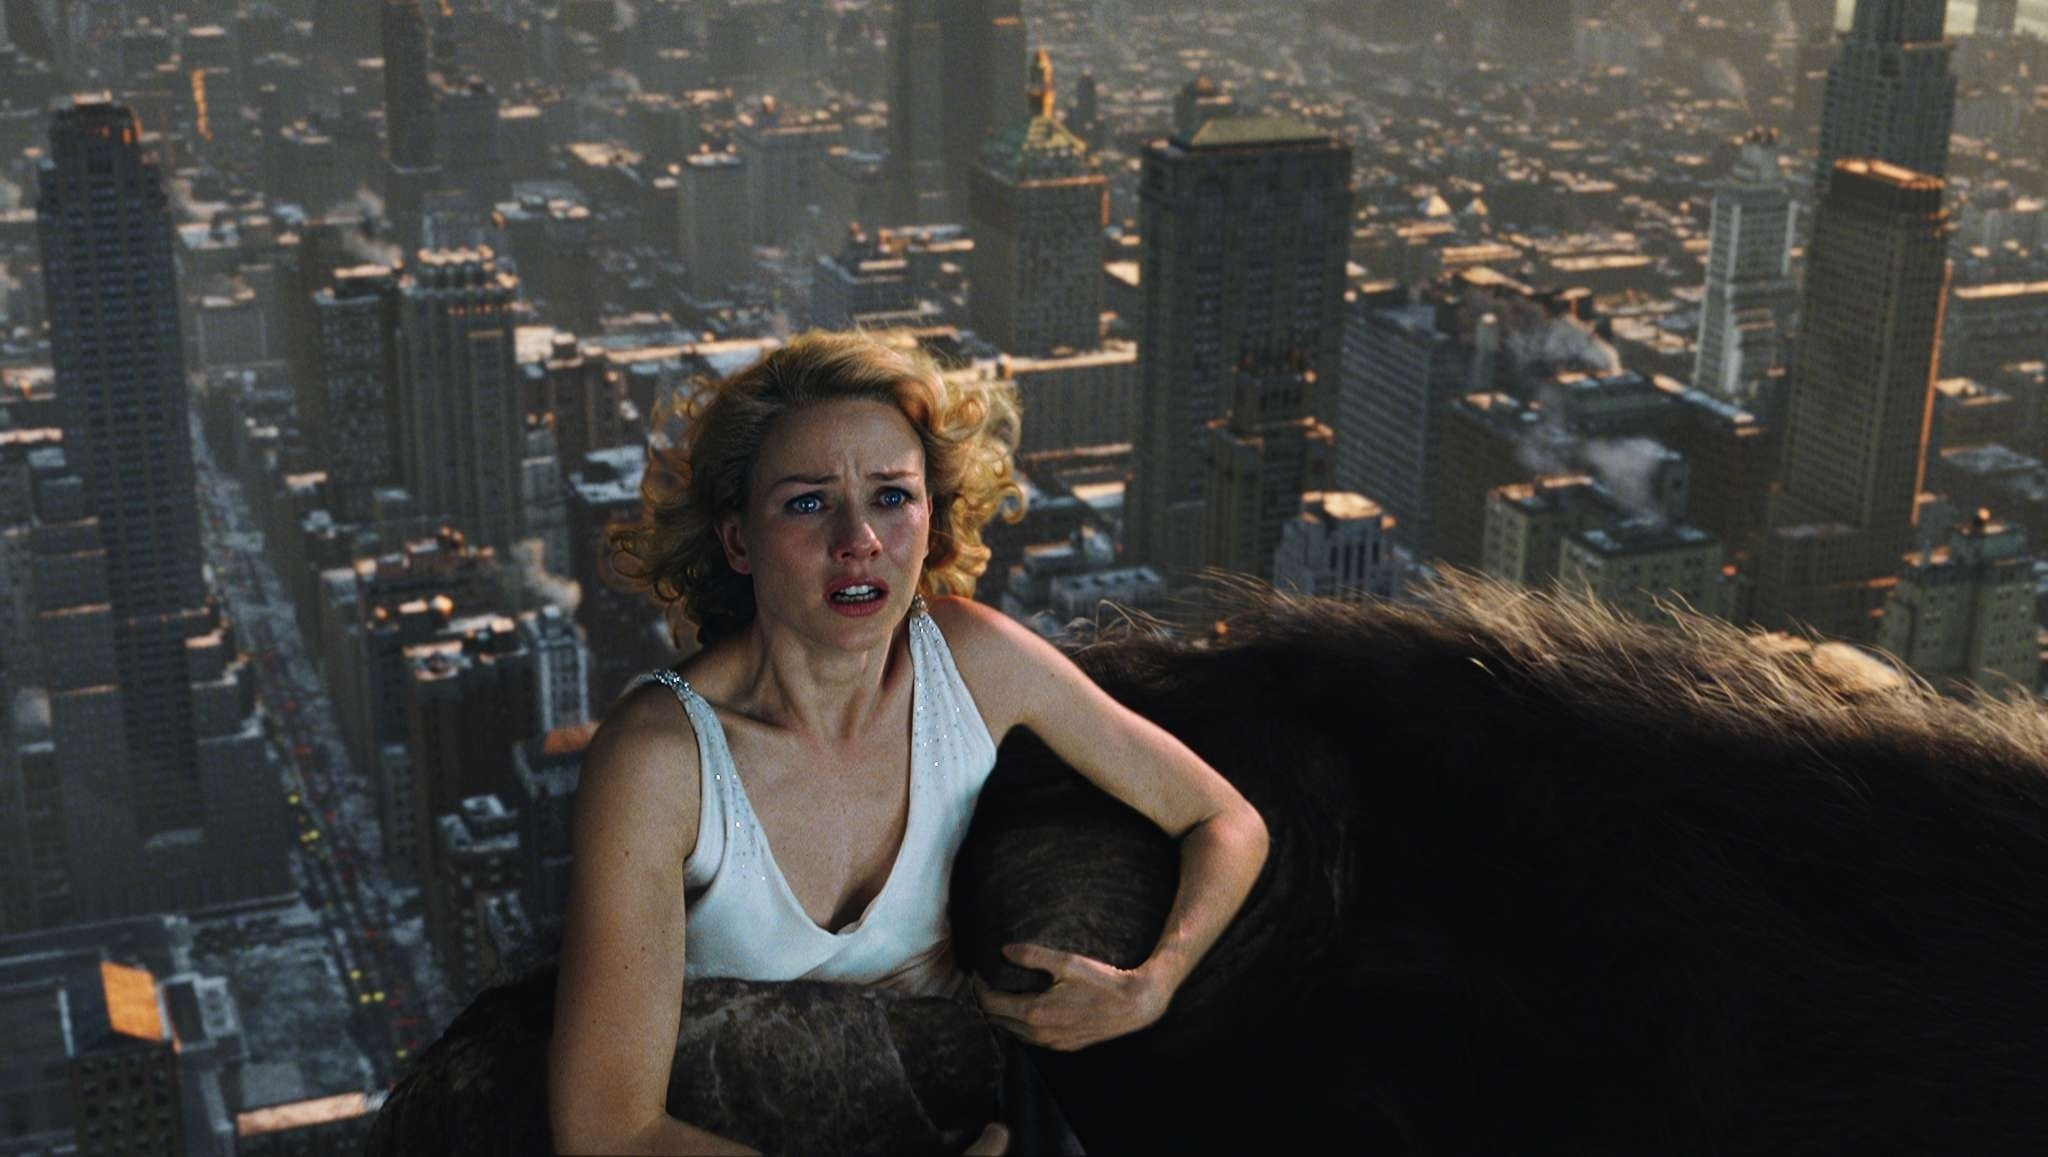 King Kong 2005 - King Kong Image (2731622) - Fanpop King Kong Empire State Building With Girl